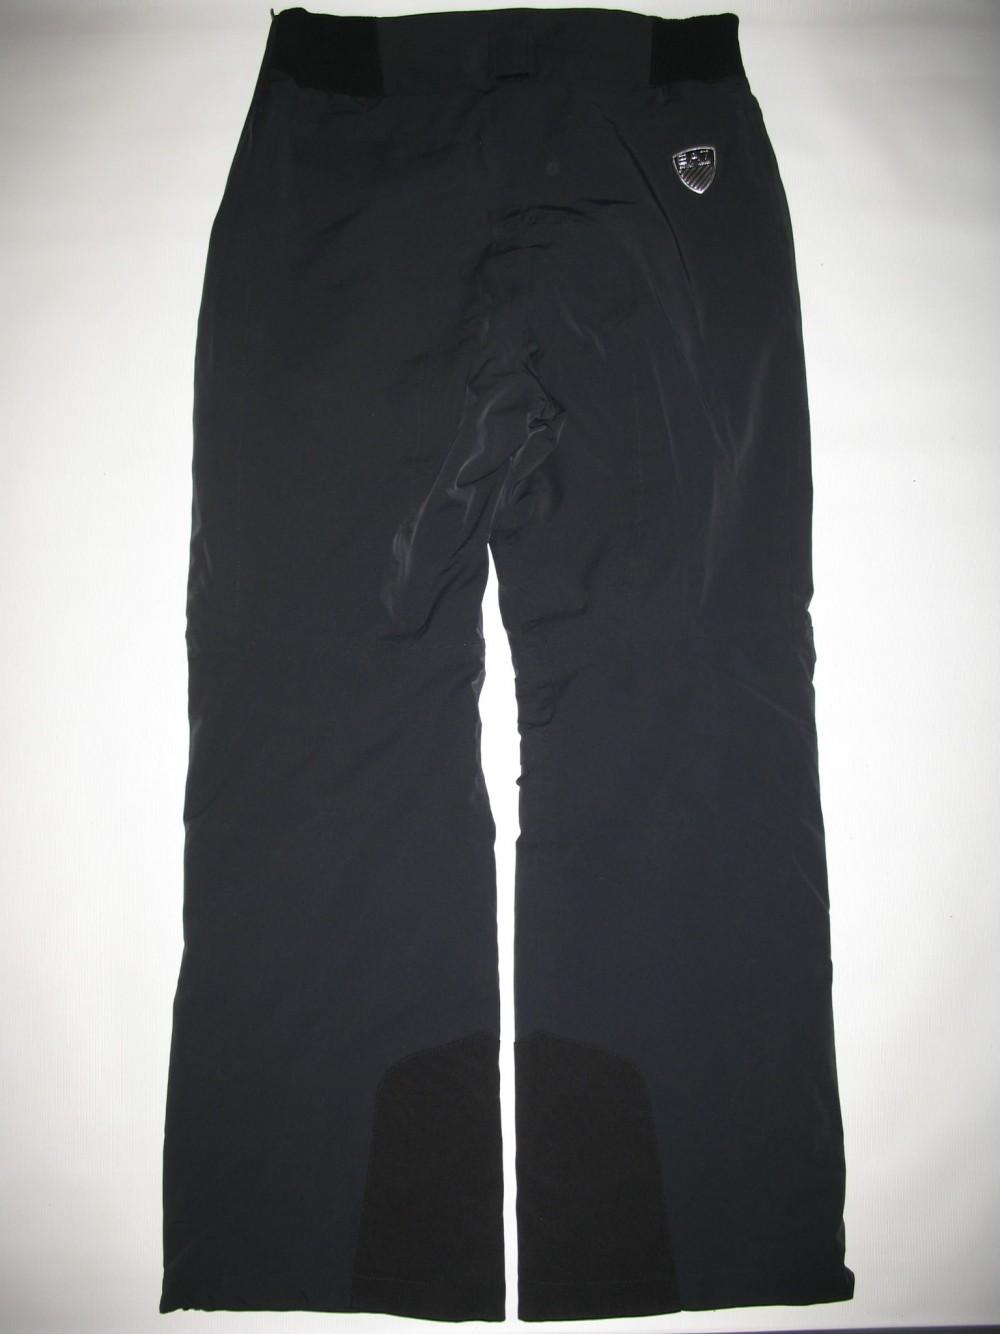 Штаны EA7 emporio armani ski bib pants ( размер XL) - 3